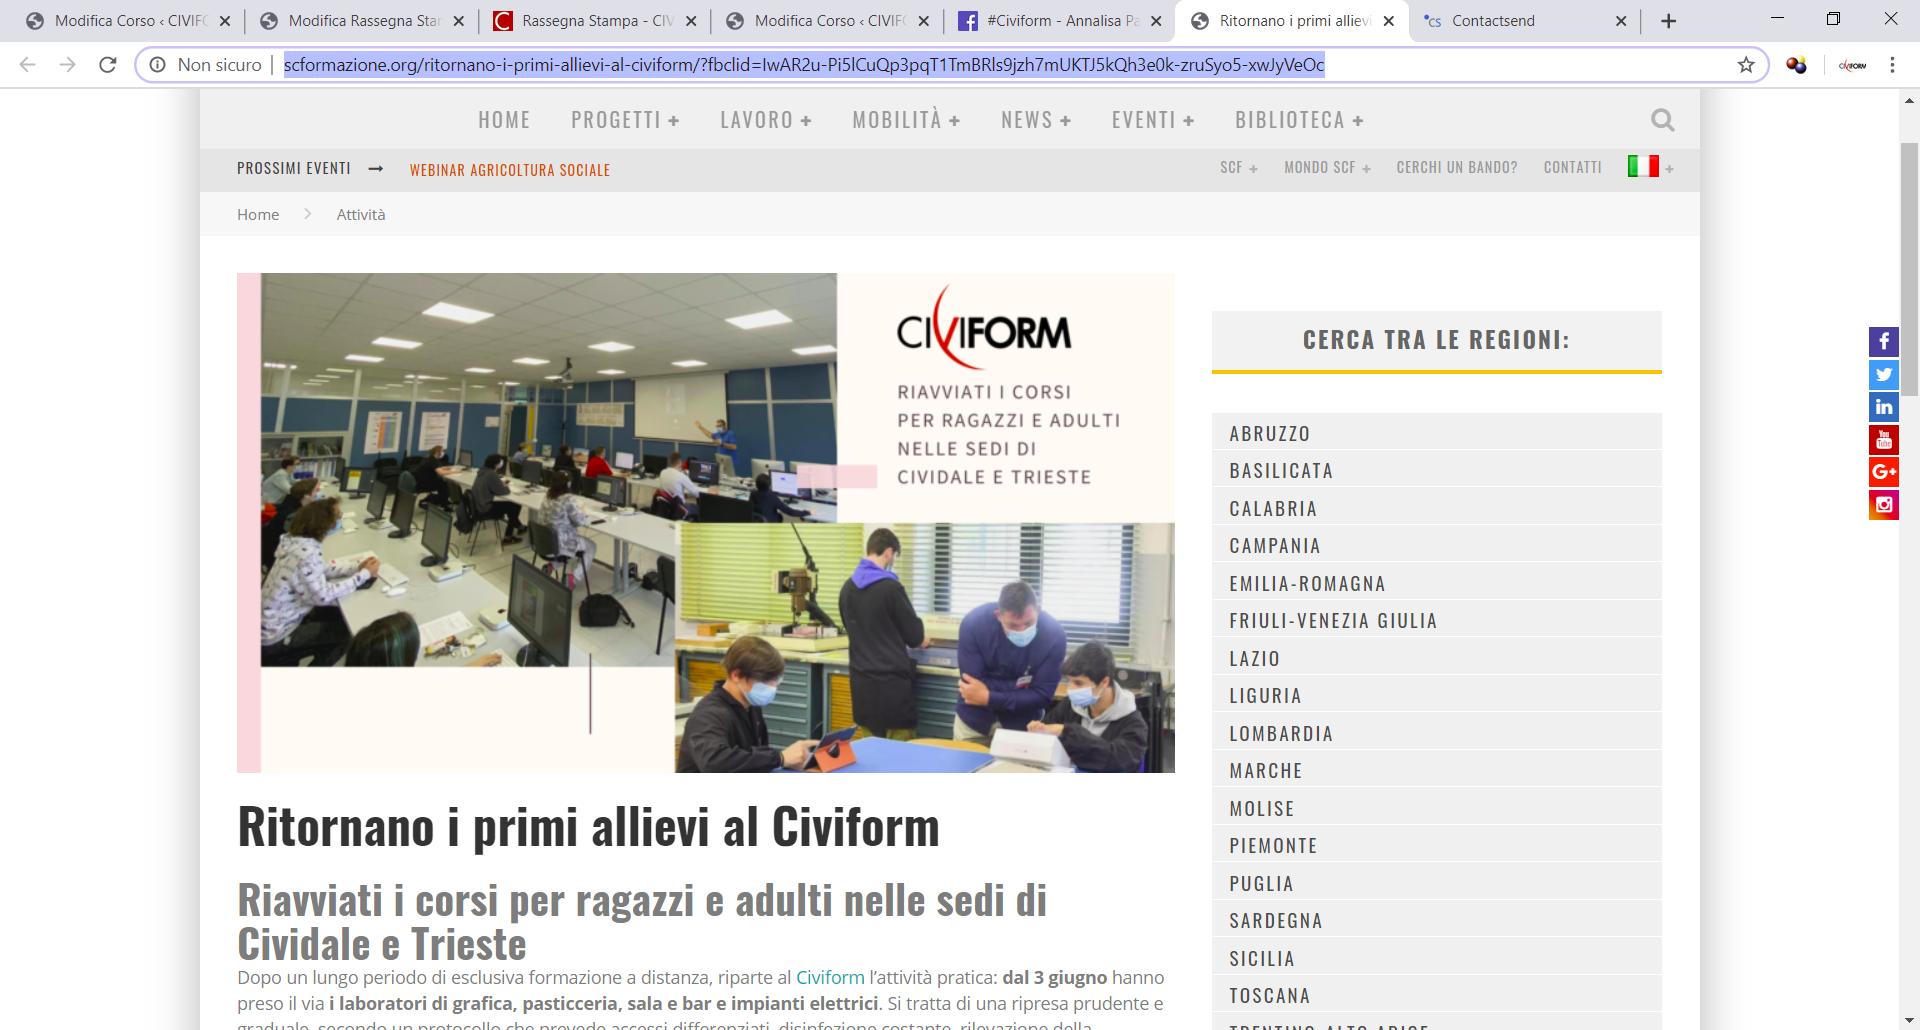 2020.06.16_www.scformazione.org